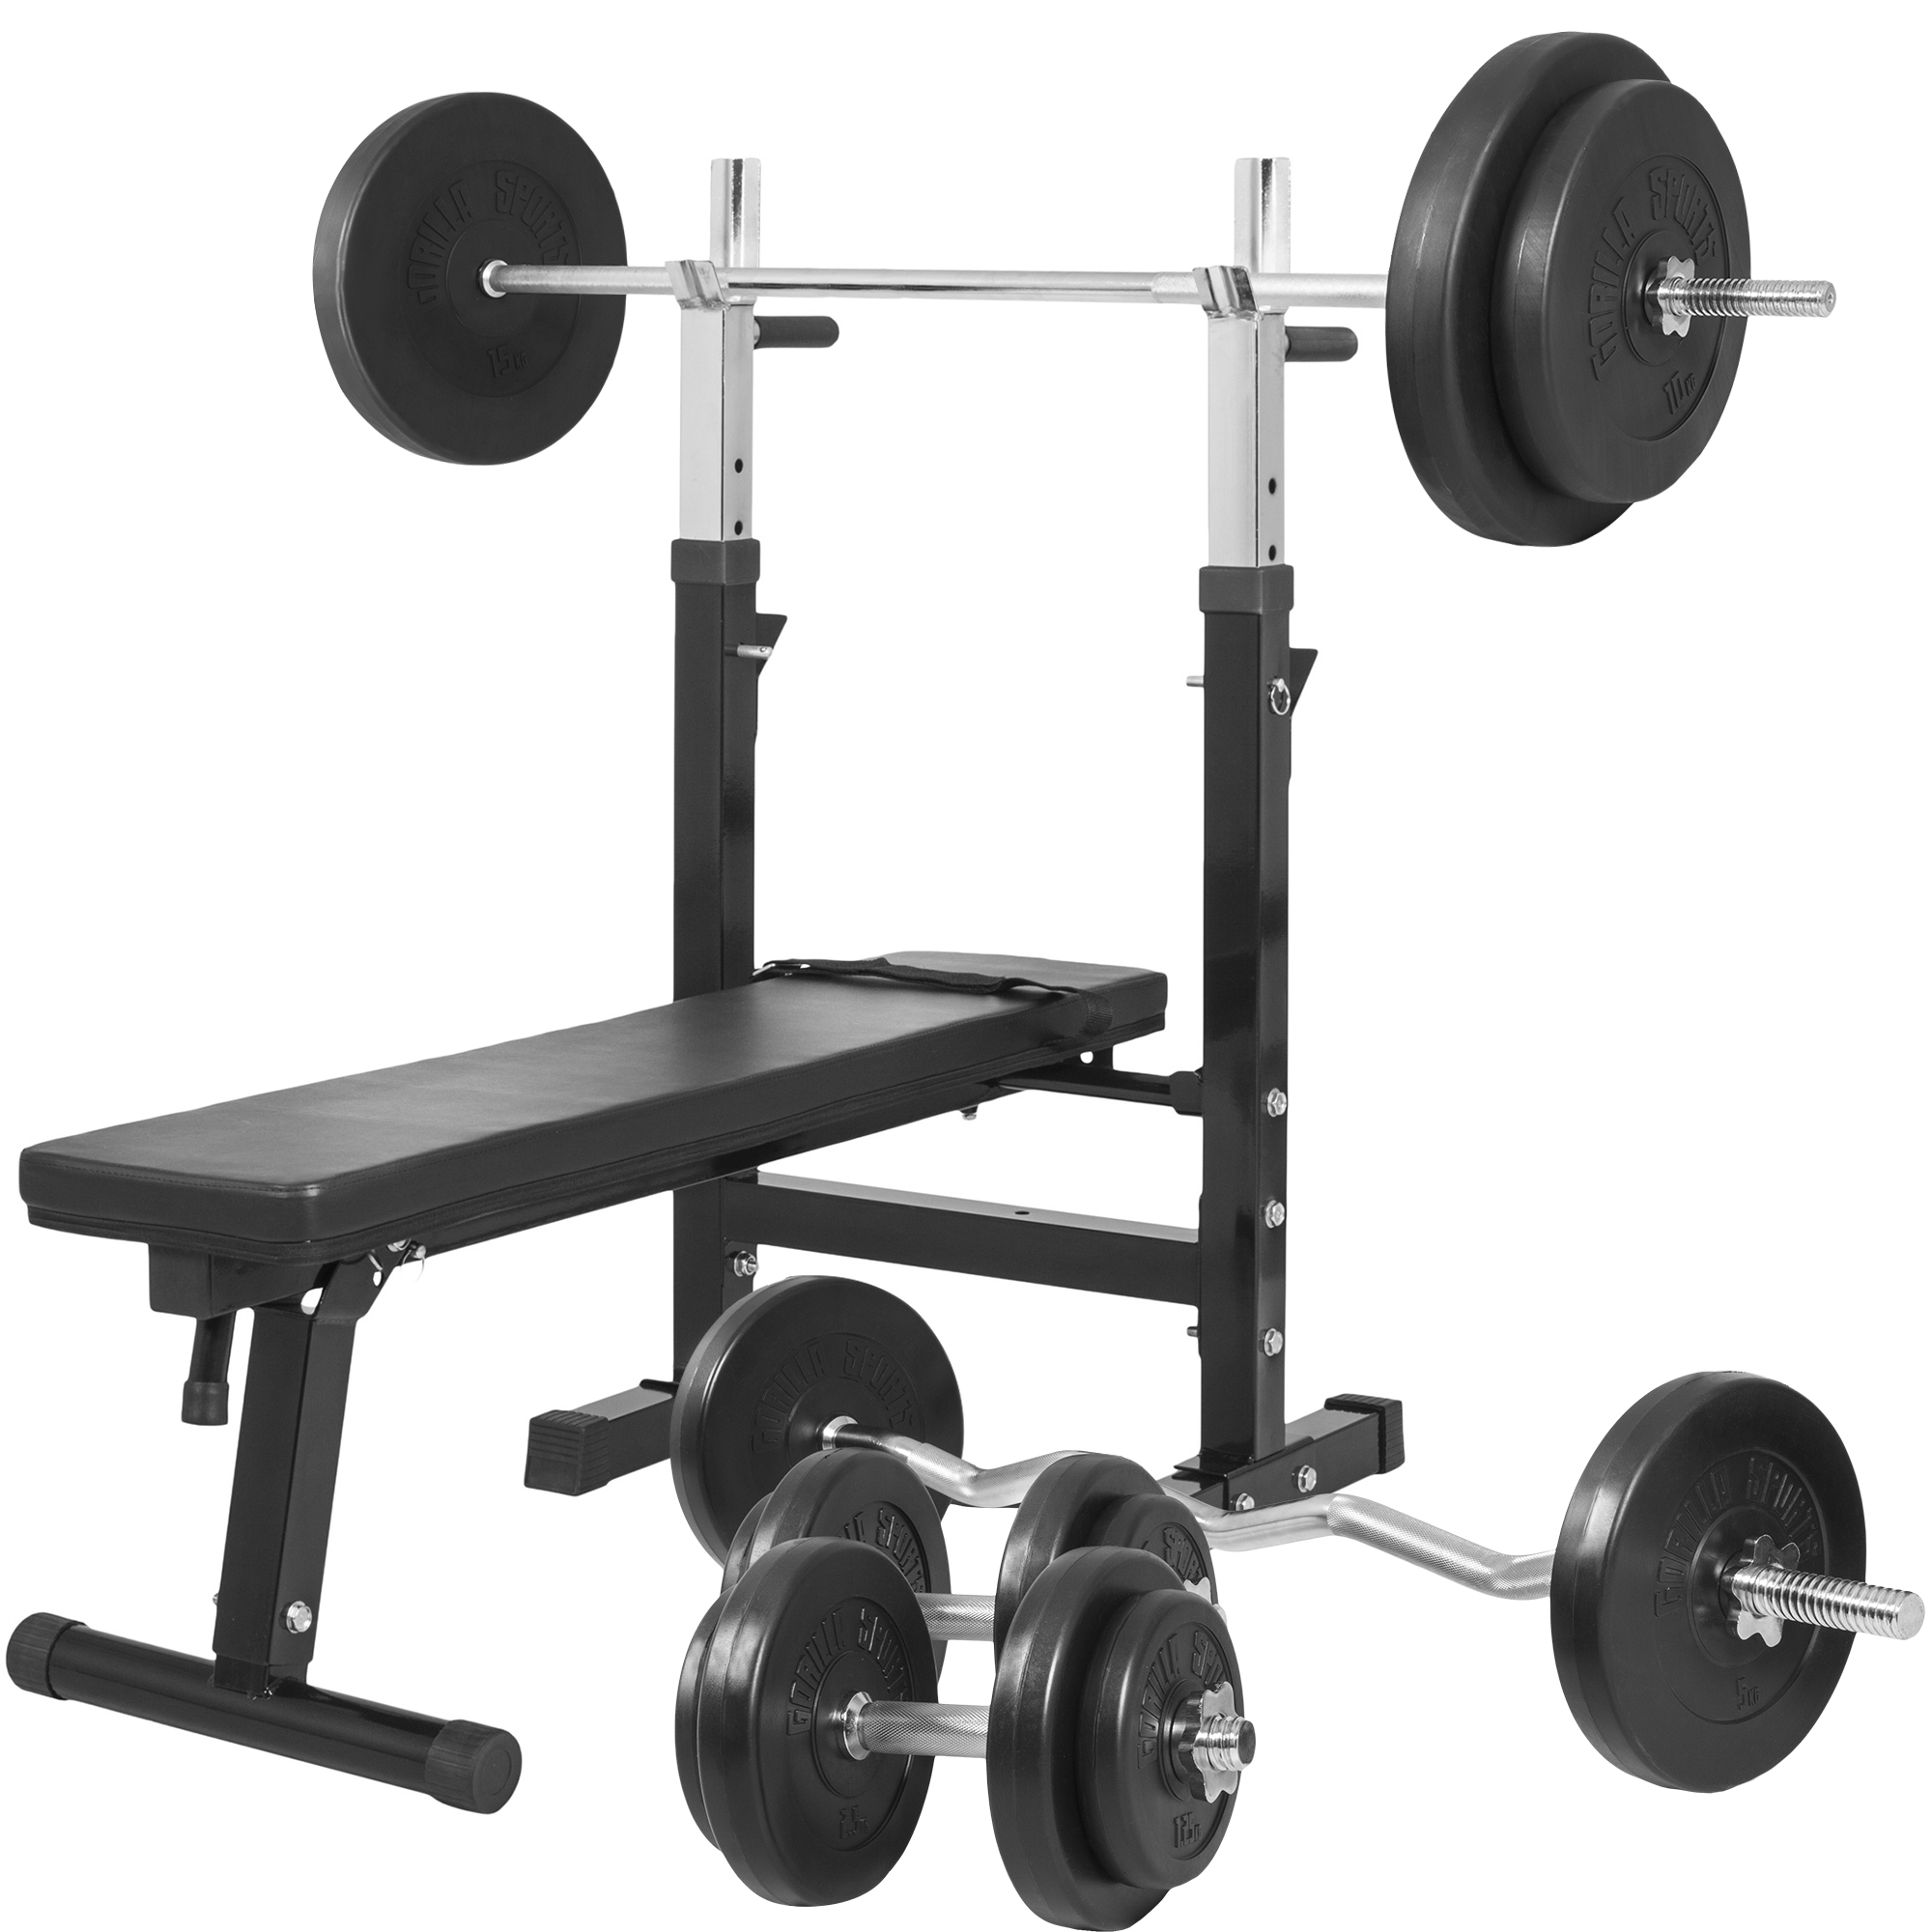 Gorilla Sports Hantelbank mit Langhantelset 100 kg 100299-00019-0048